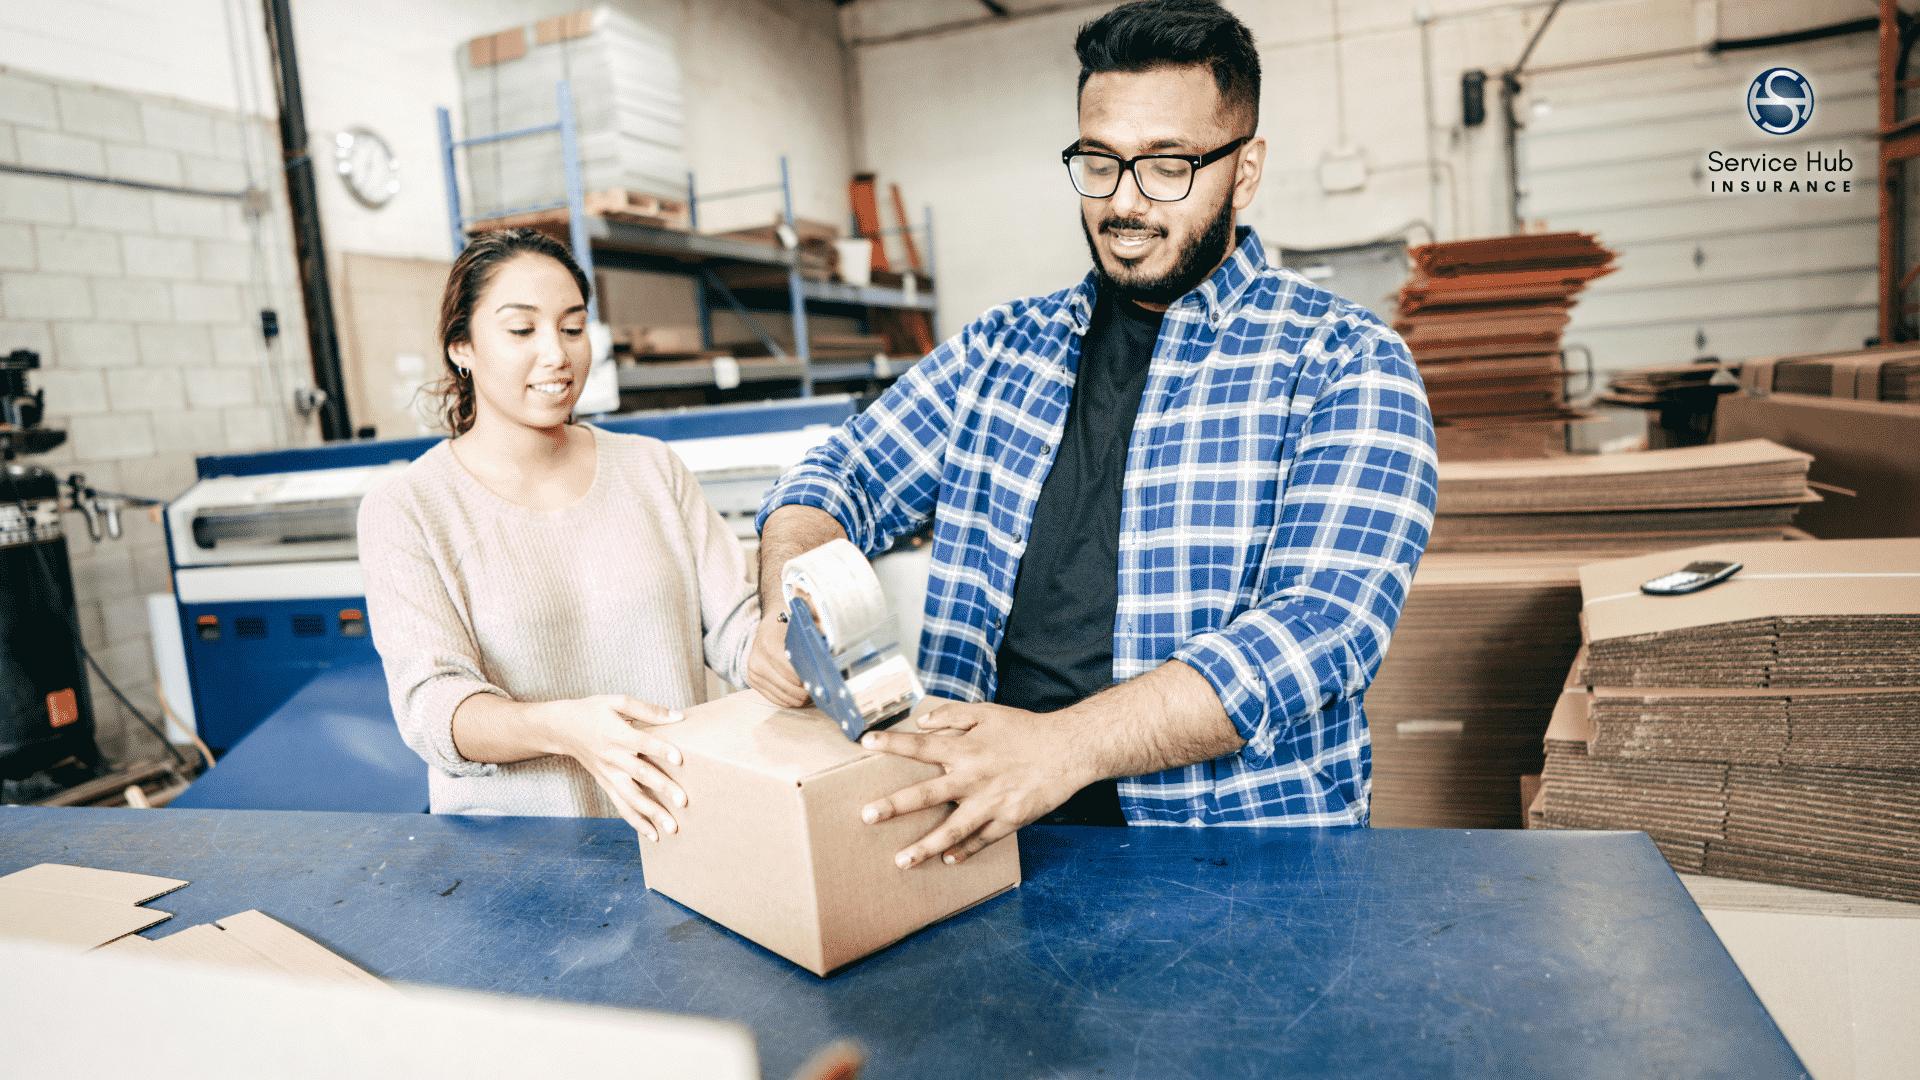 Business Insurance -  Service Hub Insurance